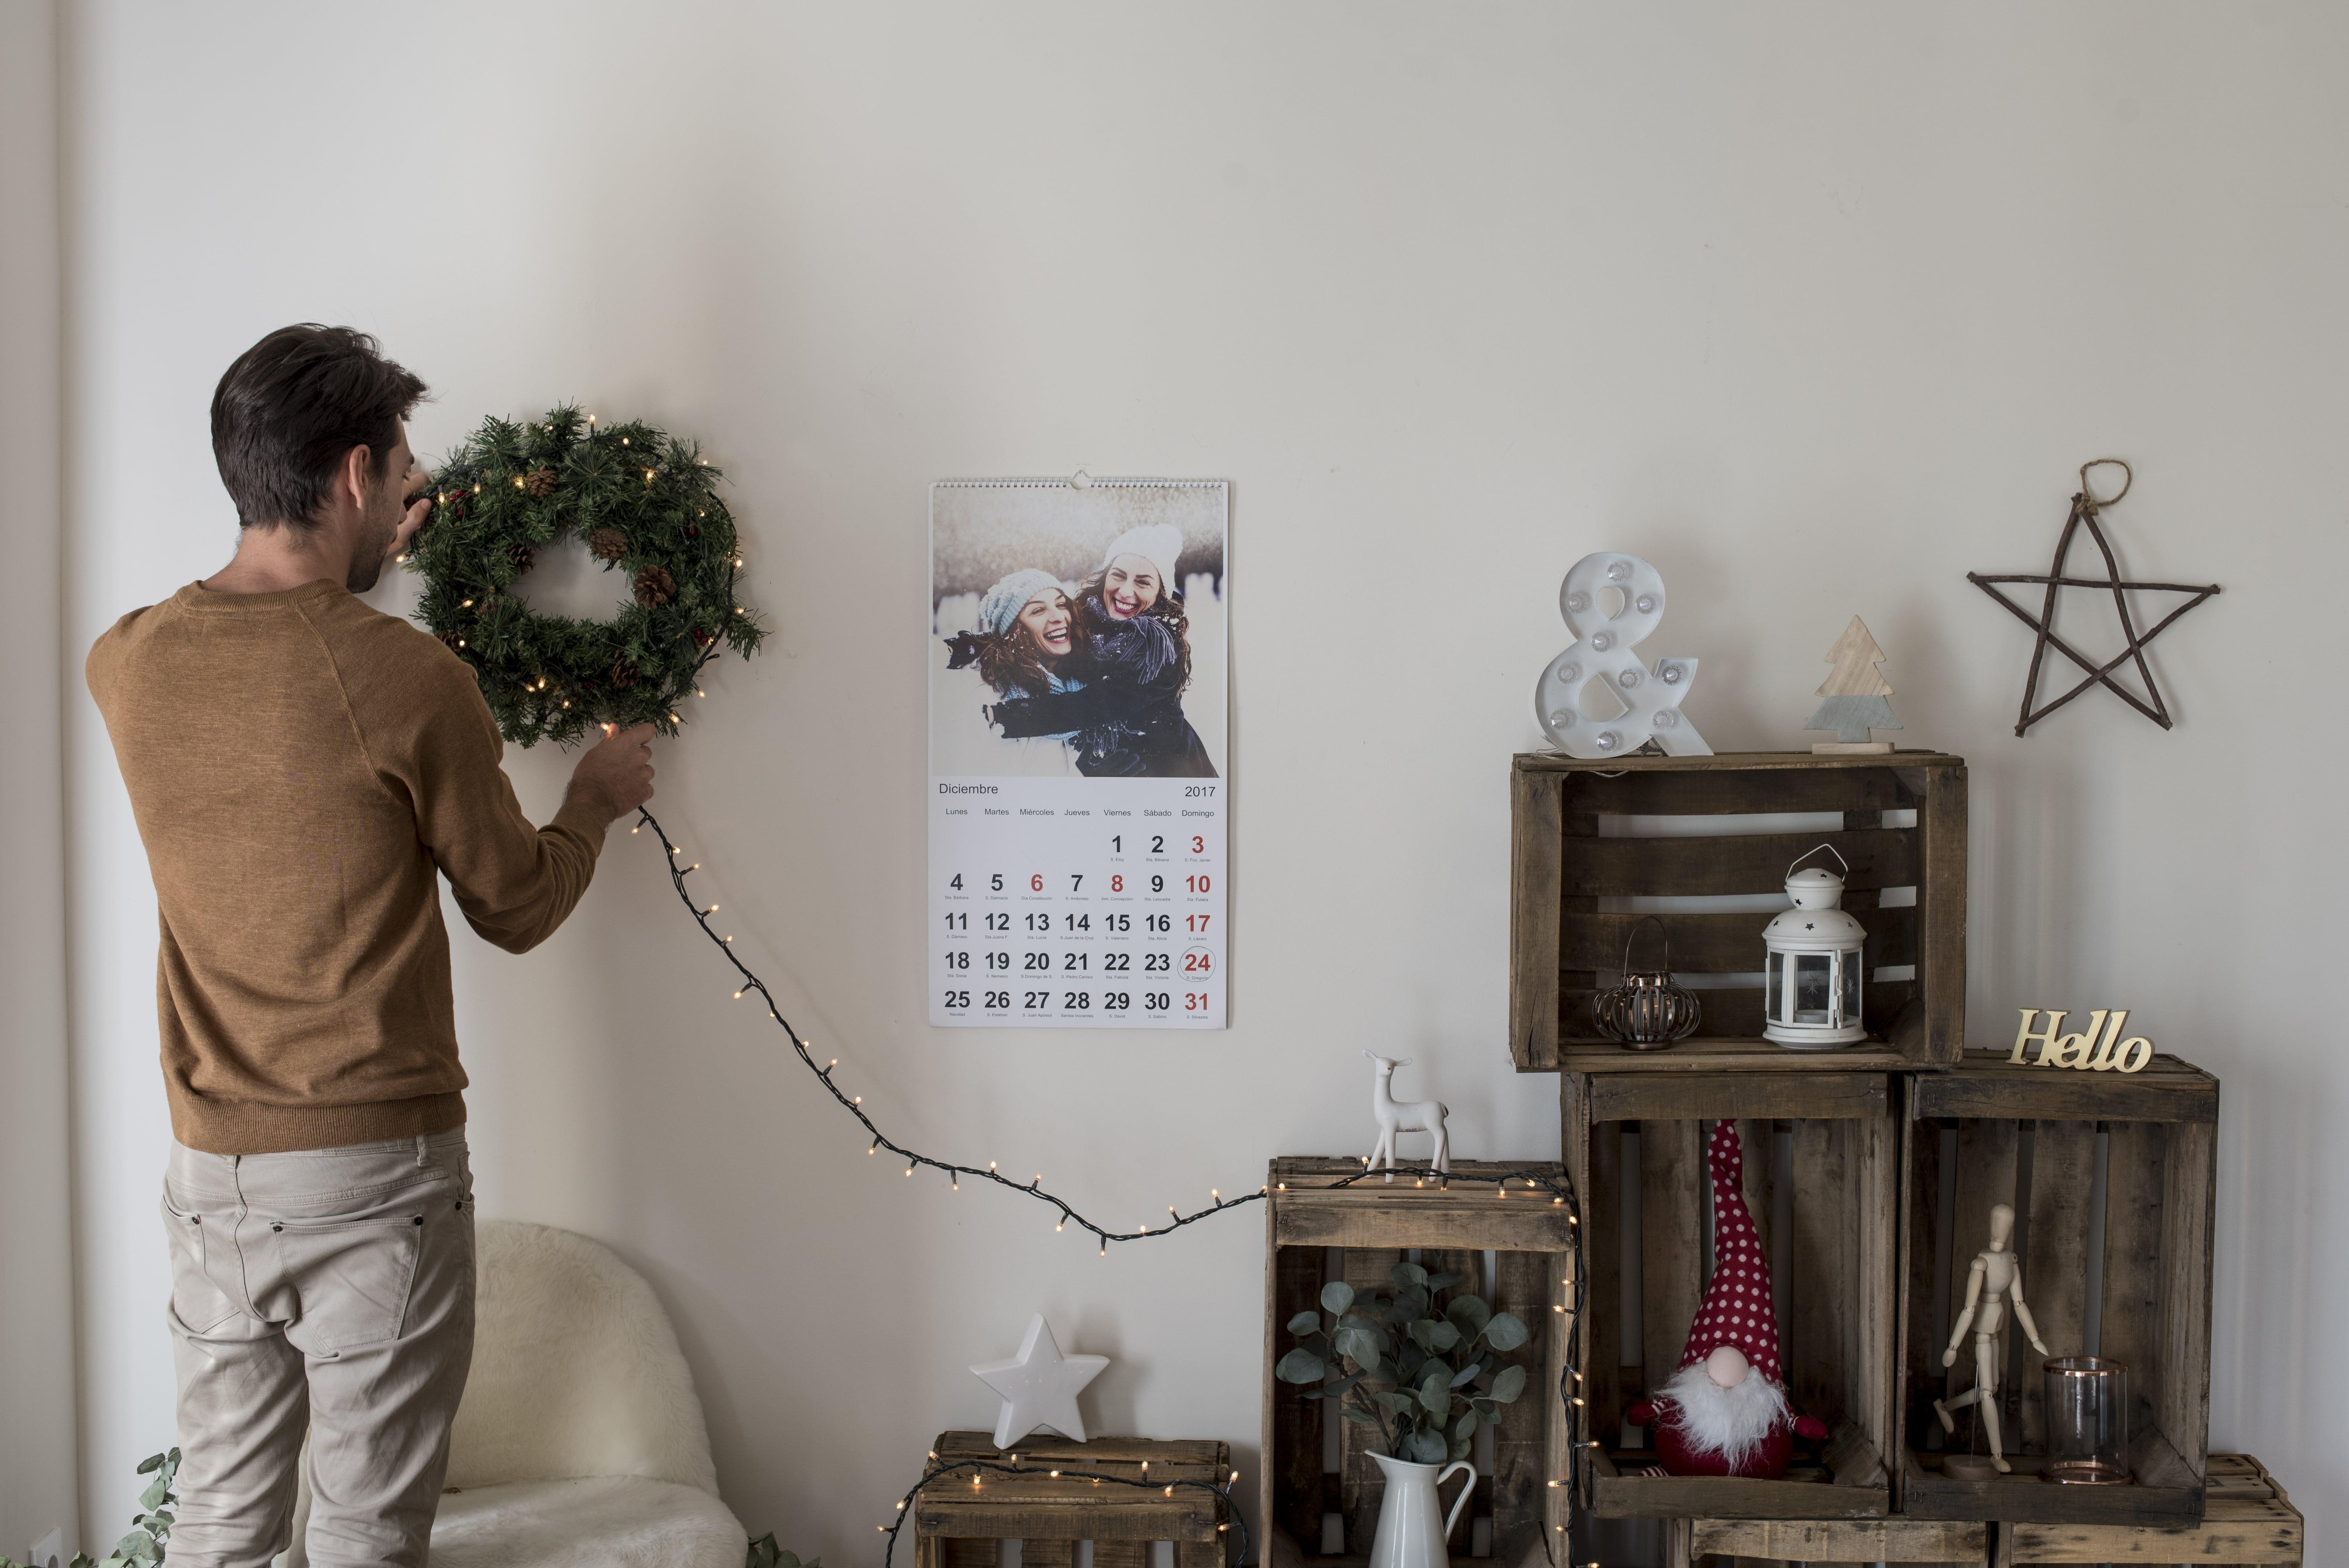 regala calendarios personalizados